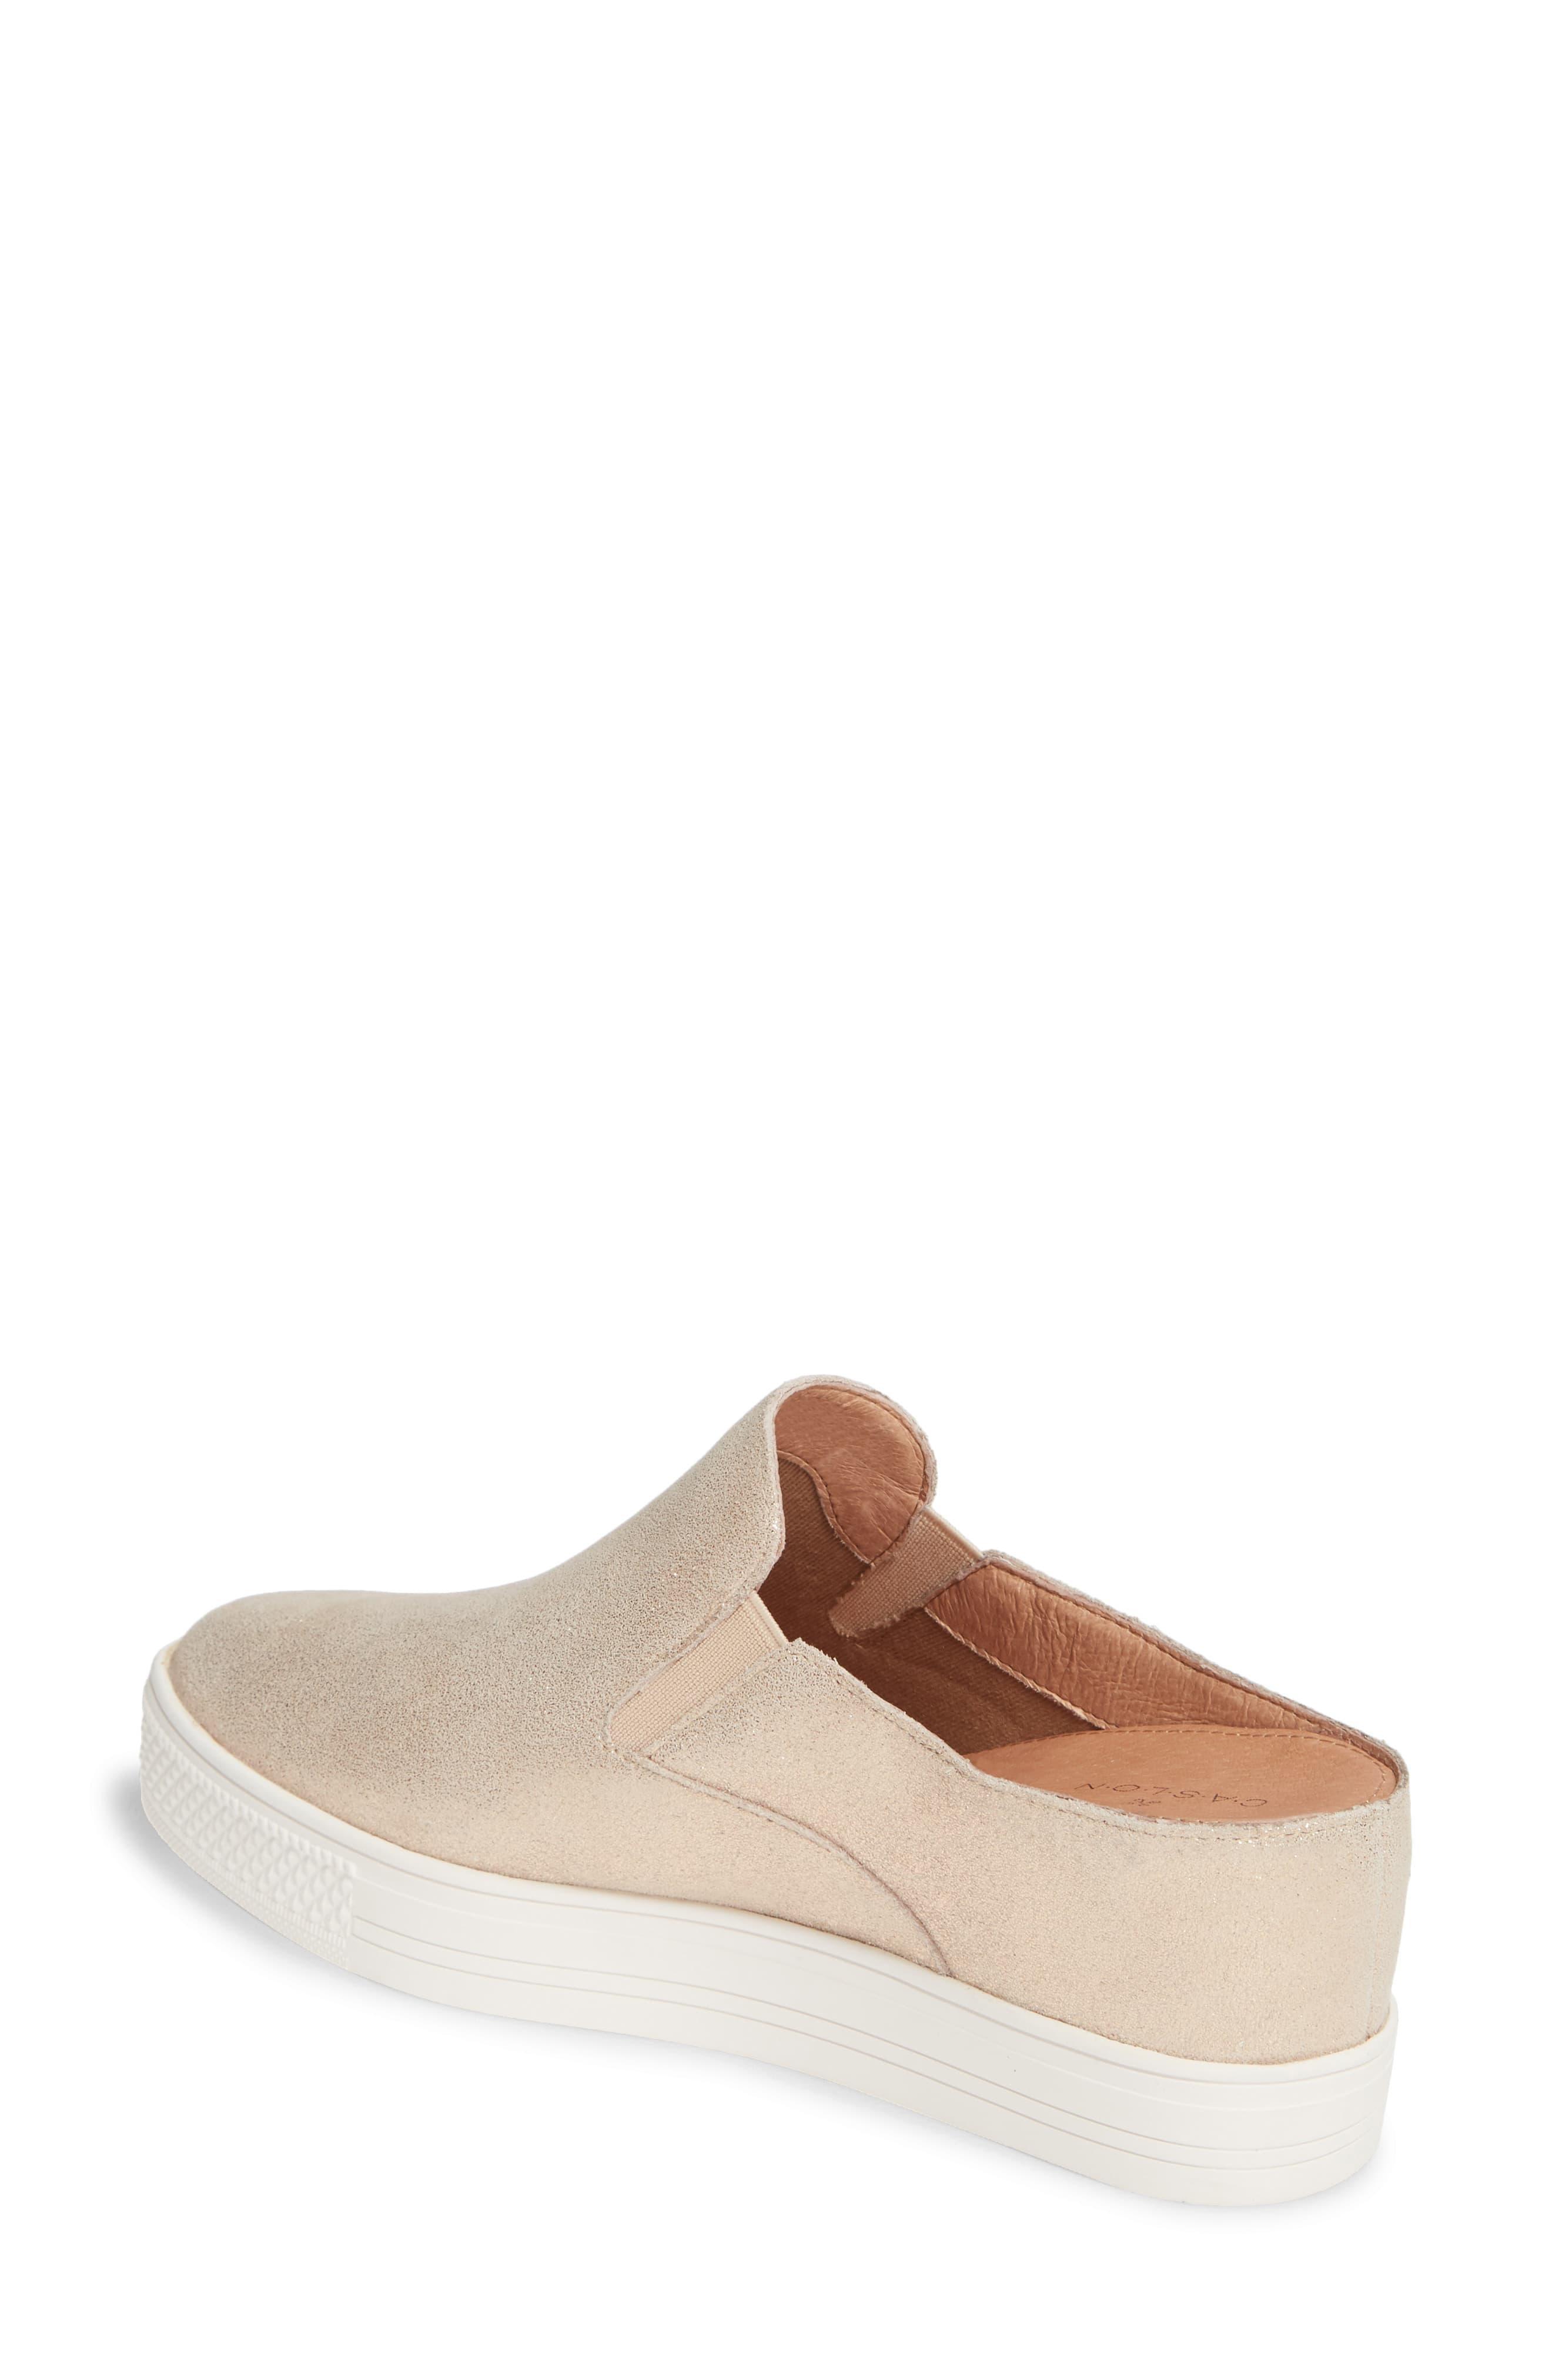 Caslon Caslon Alysha Slip-on Sneaker - Lyst